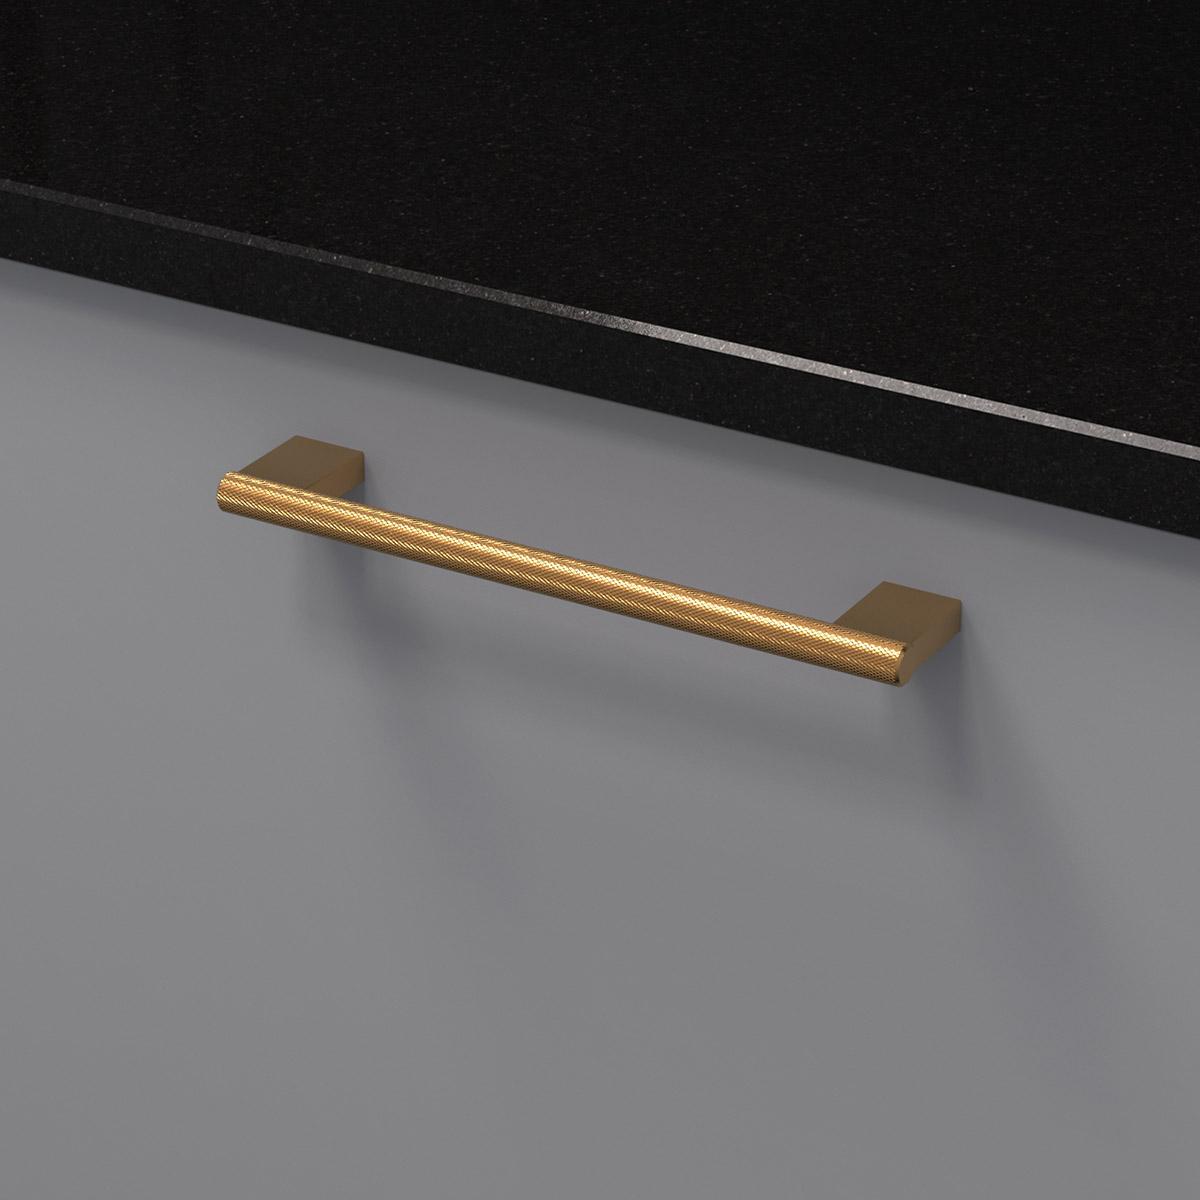 Handtag graf mini massing 370230 11 cc 160 mm ncs s 4500 n granit svart